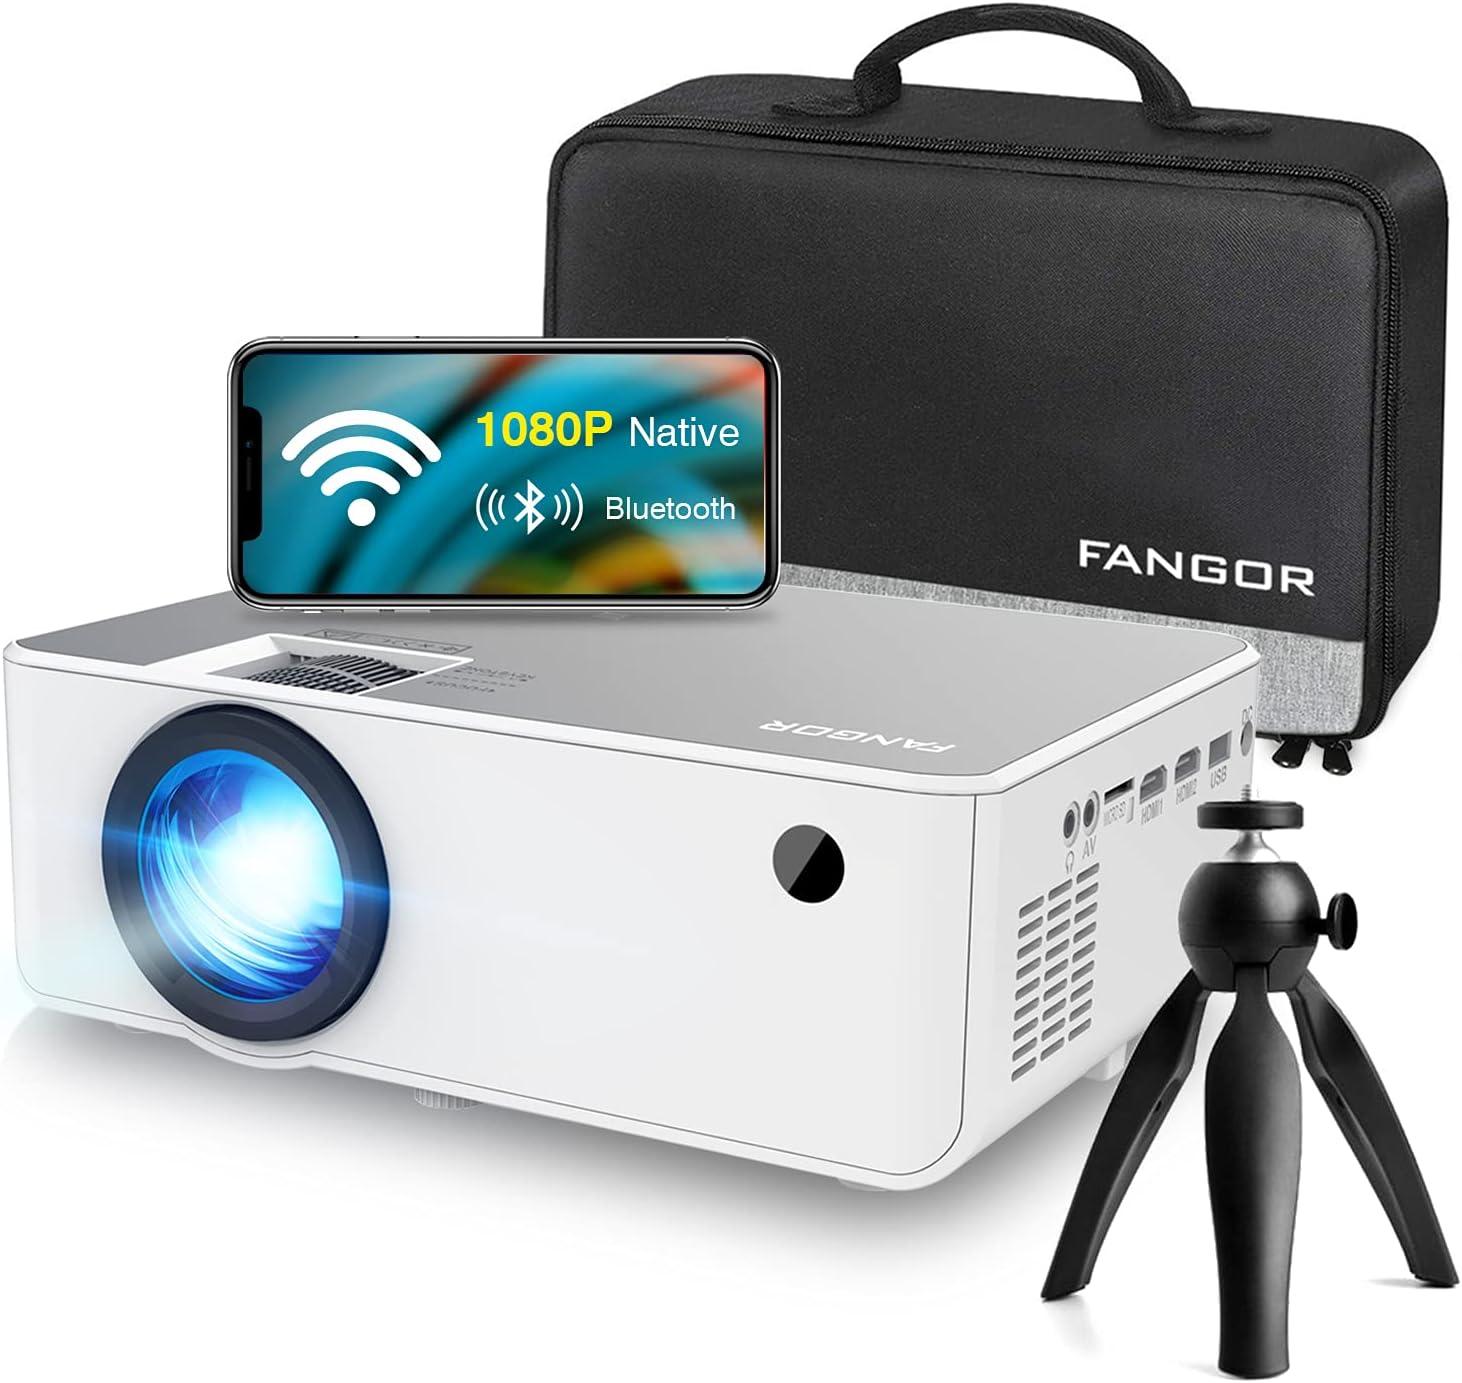 "FANGOR 230"" HD 1080P WiFi Bluetooth Projector $132.98 Coupon"